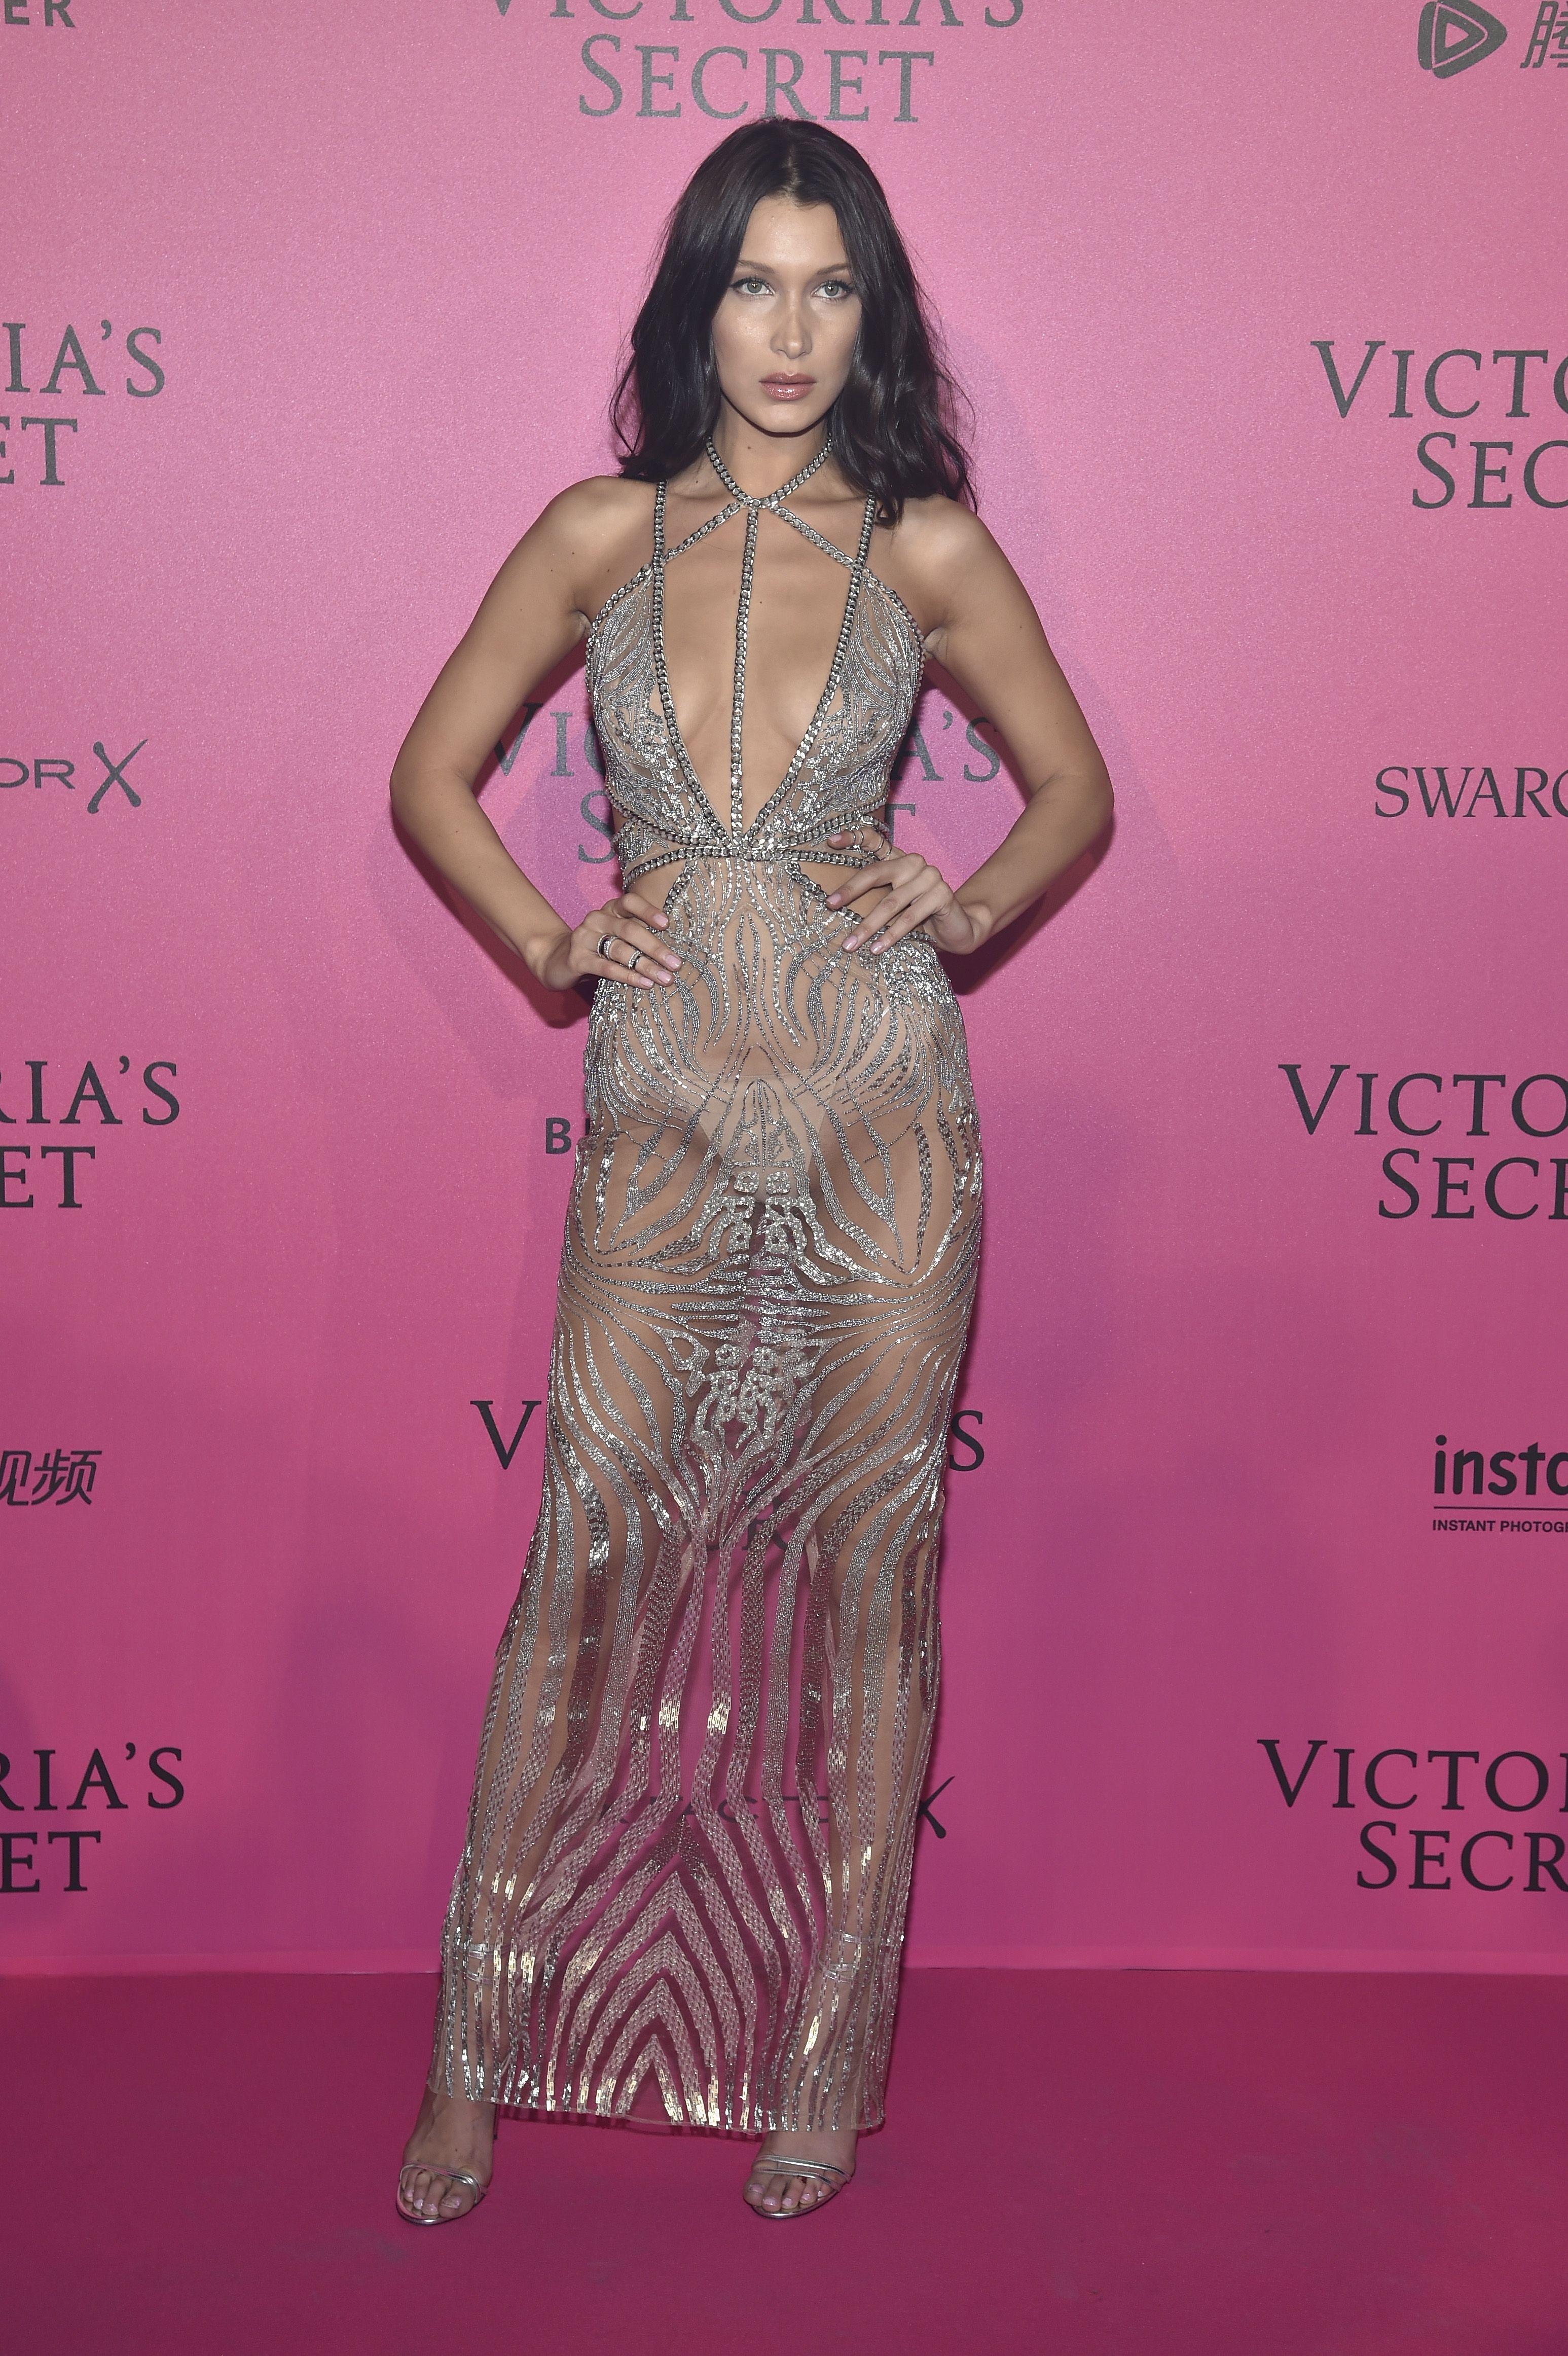 Video Lady Victoria nudes (44 photo), Ass, Sideboobs, Feet, butt 2018